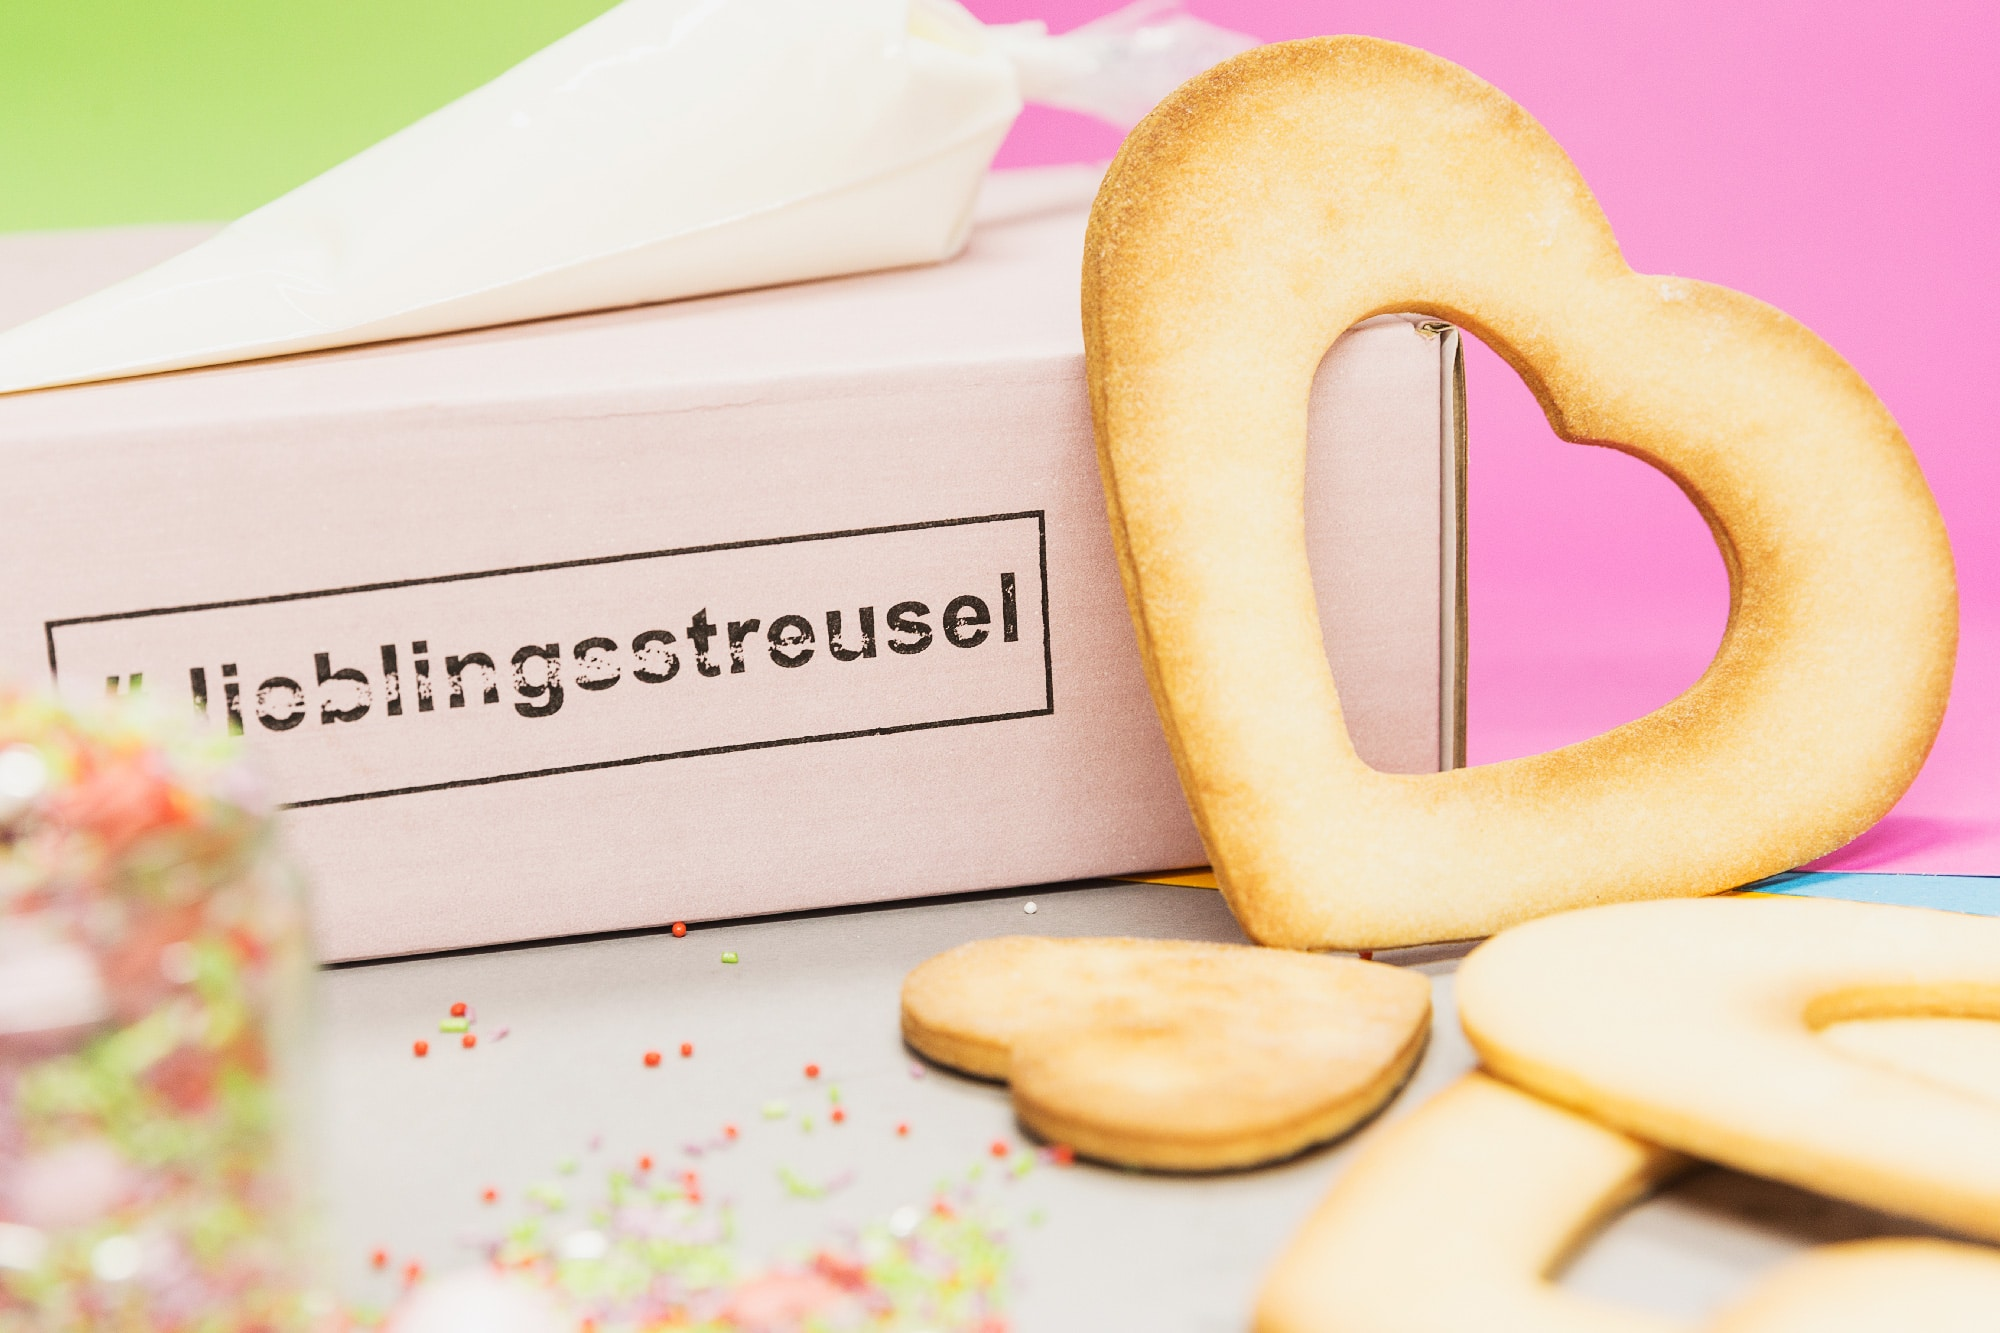 lieblingsstreusel-lieblingskuchen-lettercake-streusel